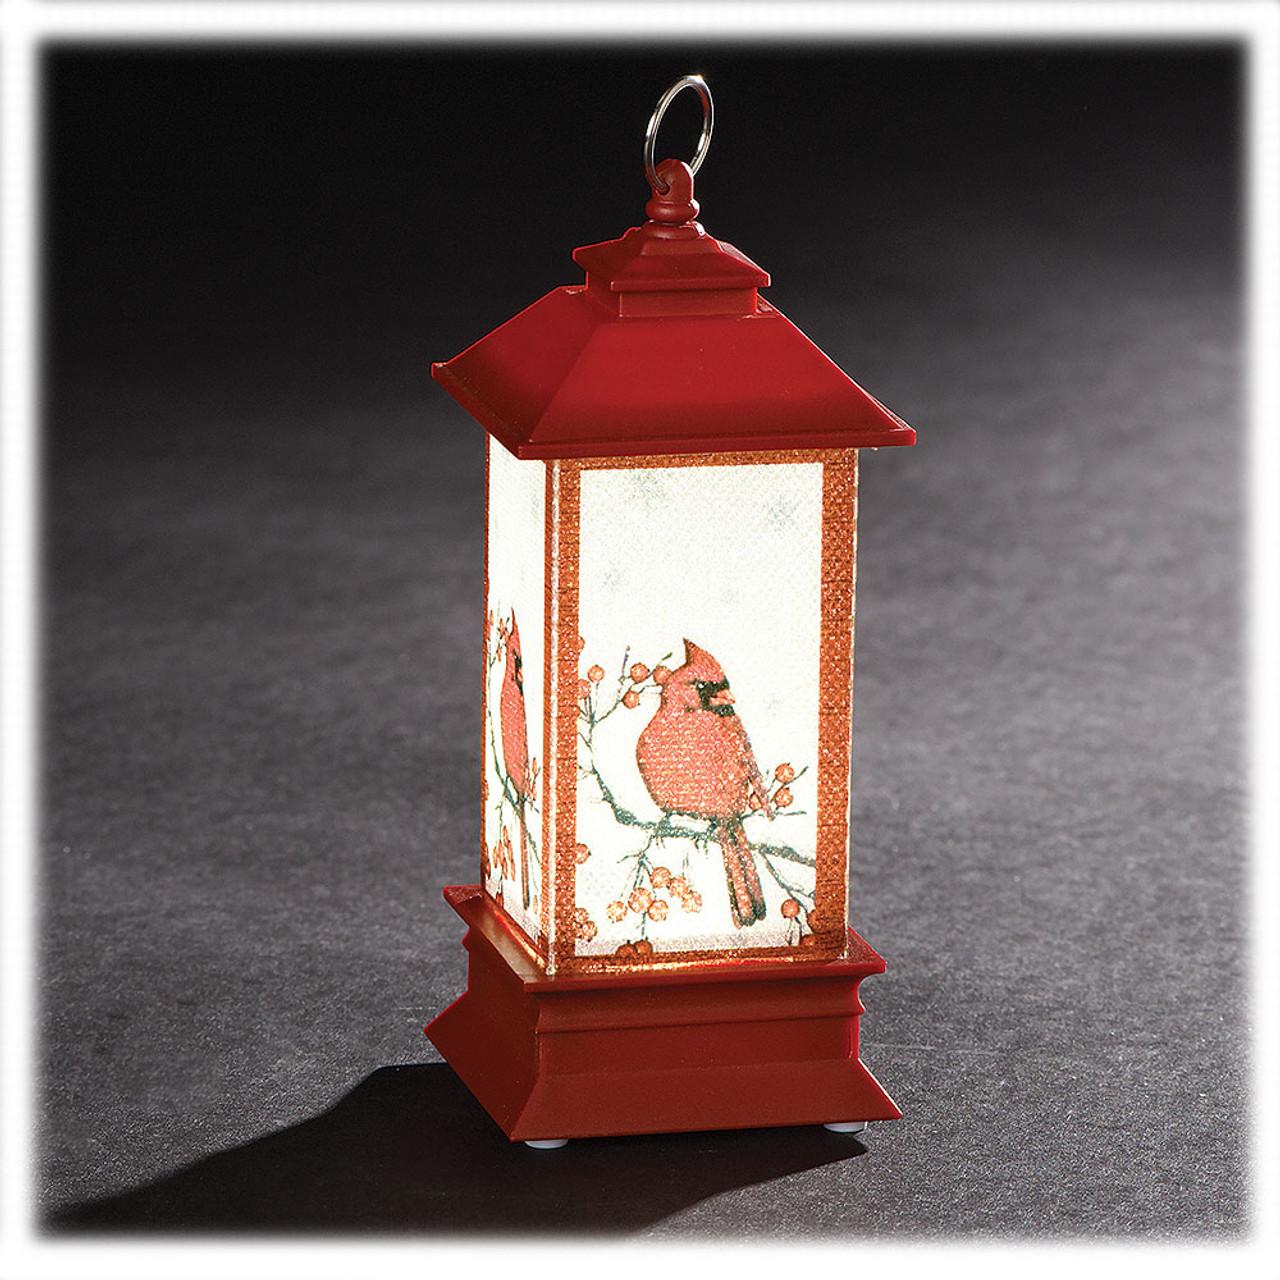 Red Lantern Ornament w/Cardinal